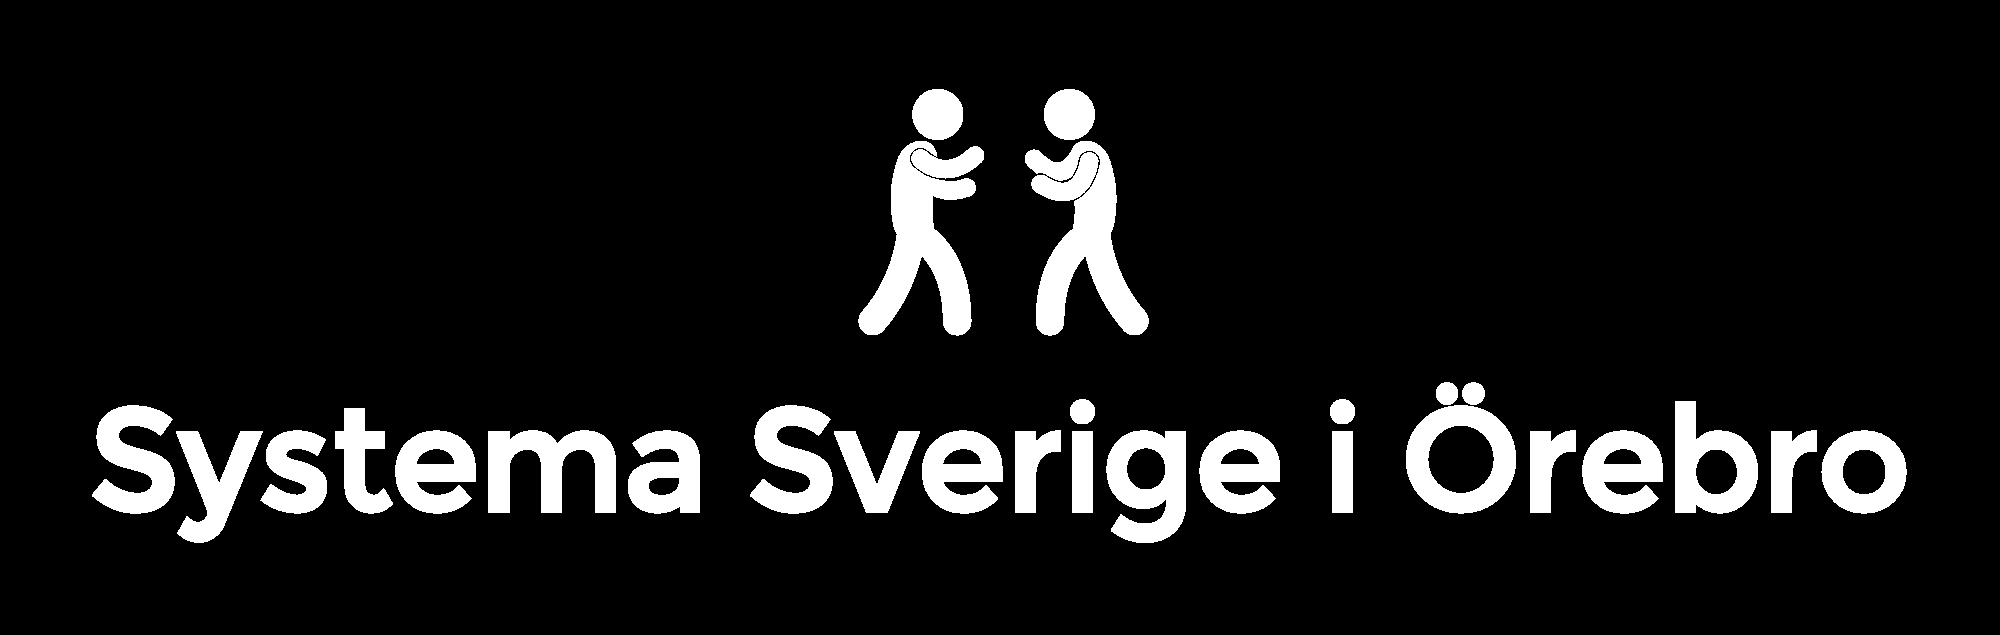 Systema Sverige i Örebro-logo-black 2.png